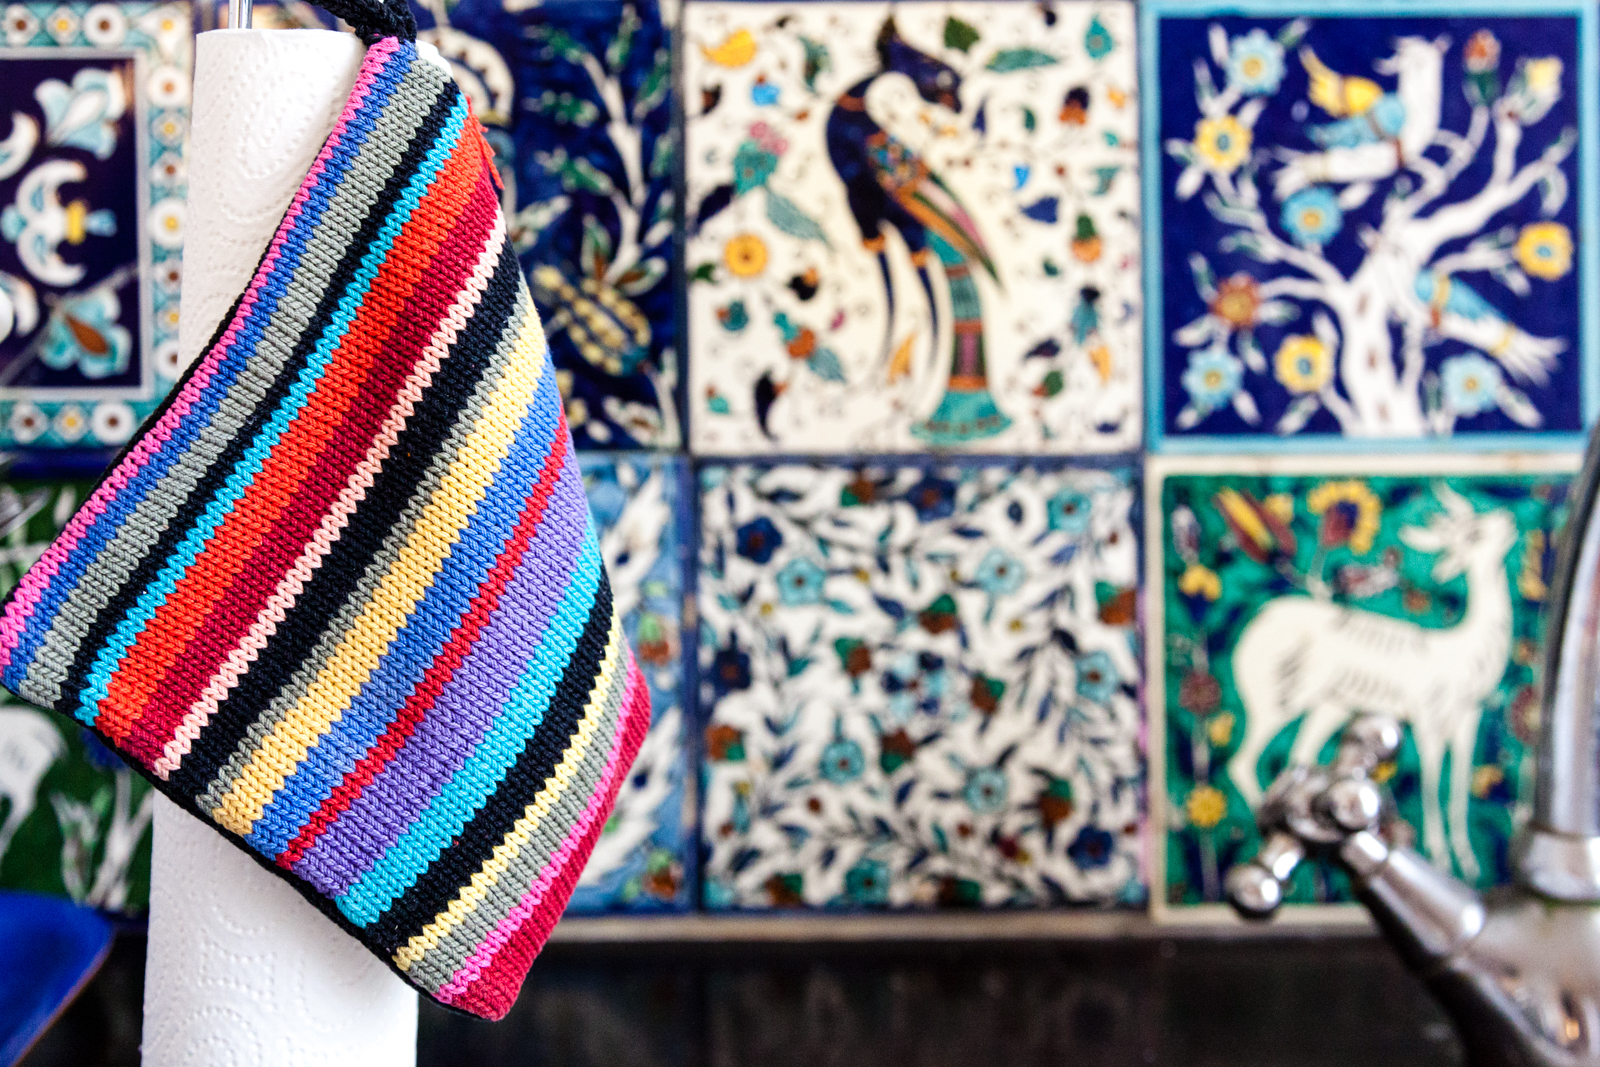 Tiles and Knitting Wear from Gunilla Weinraub